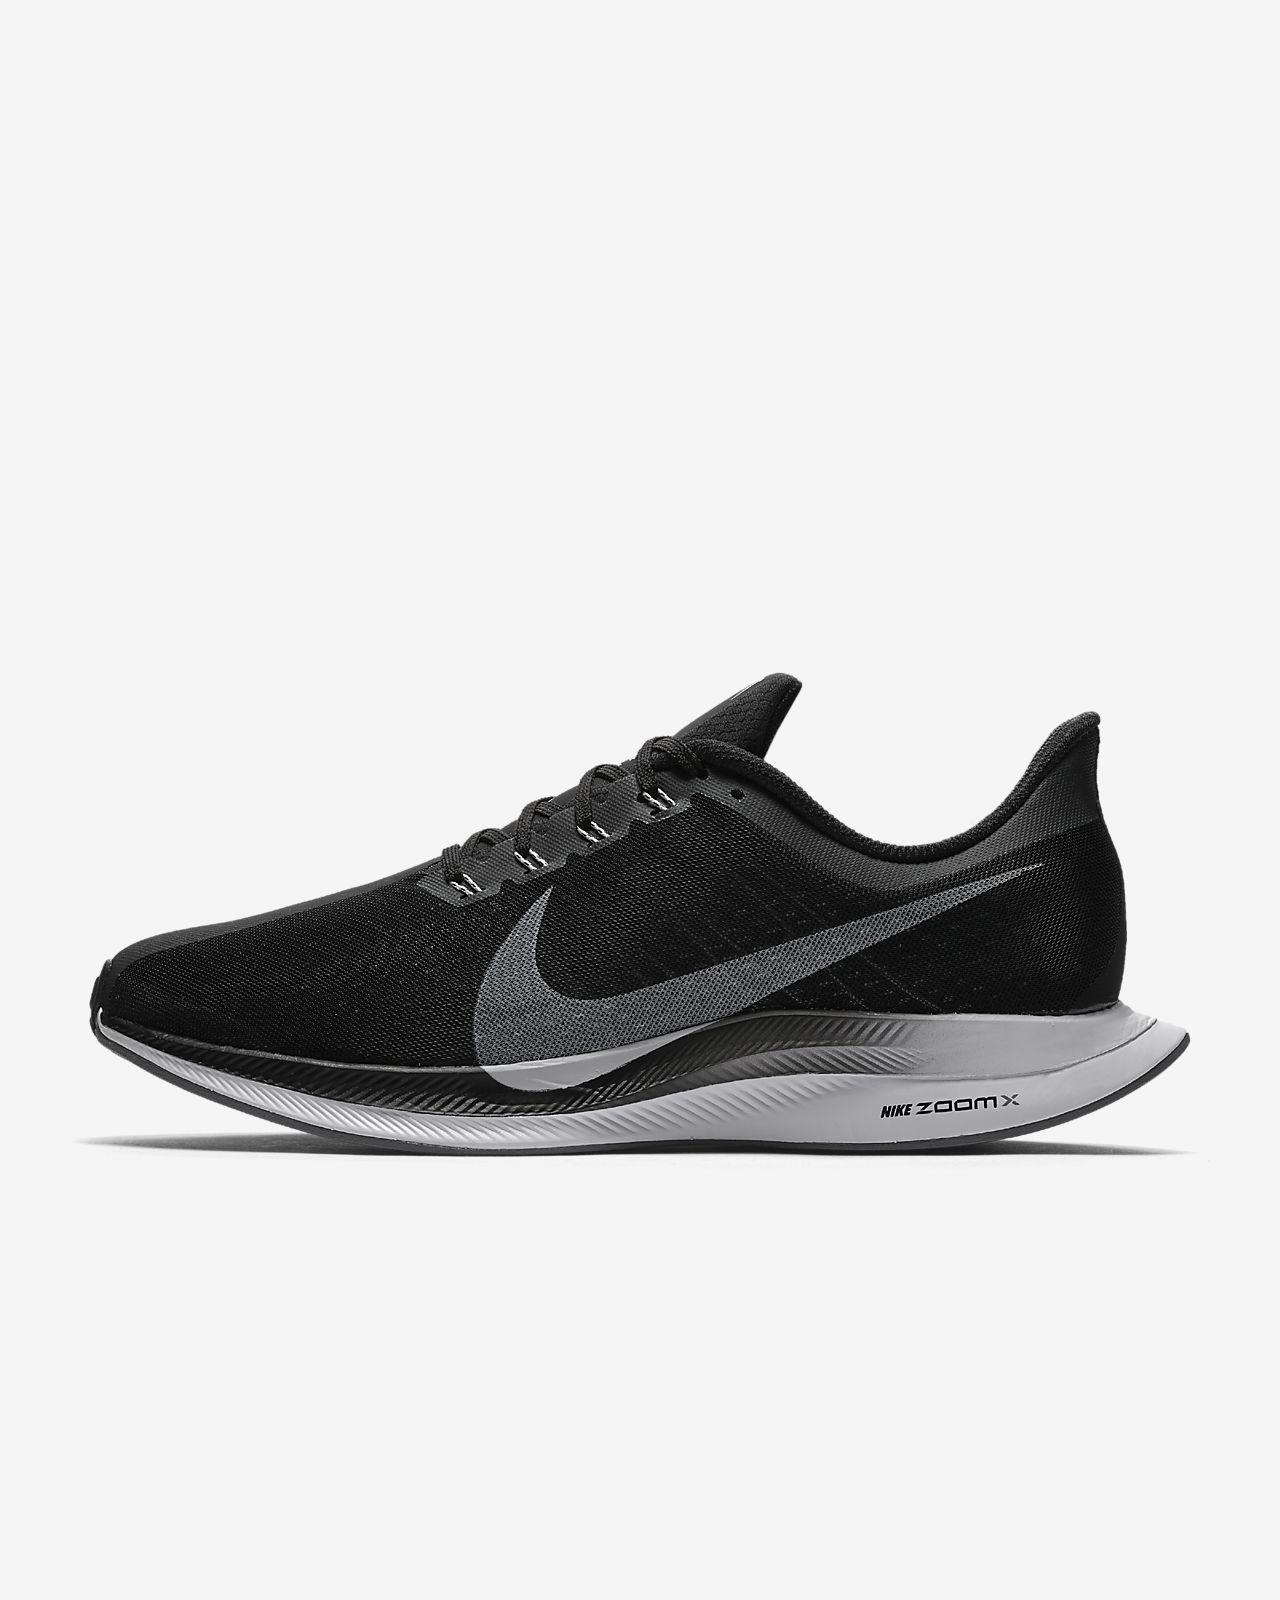 Sapatilhas de running Nike Zoom Pegasus Turbo para homem